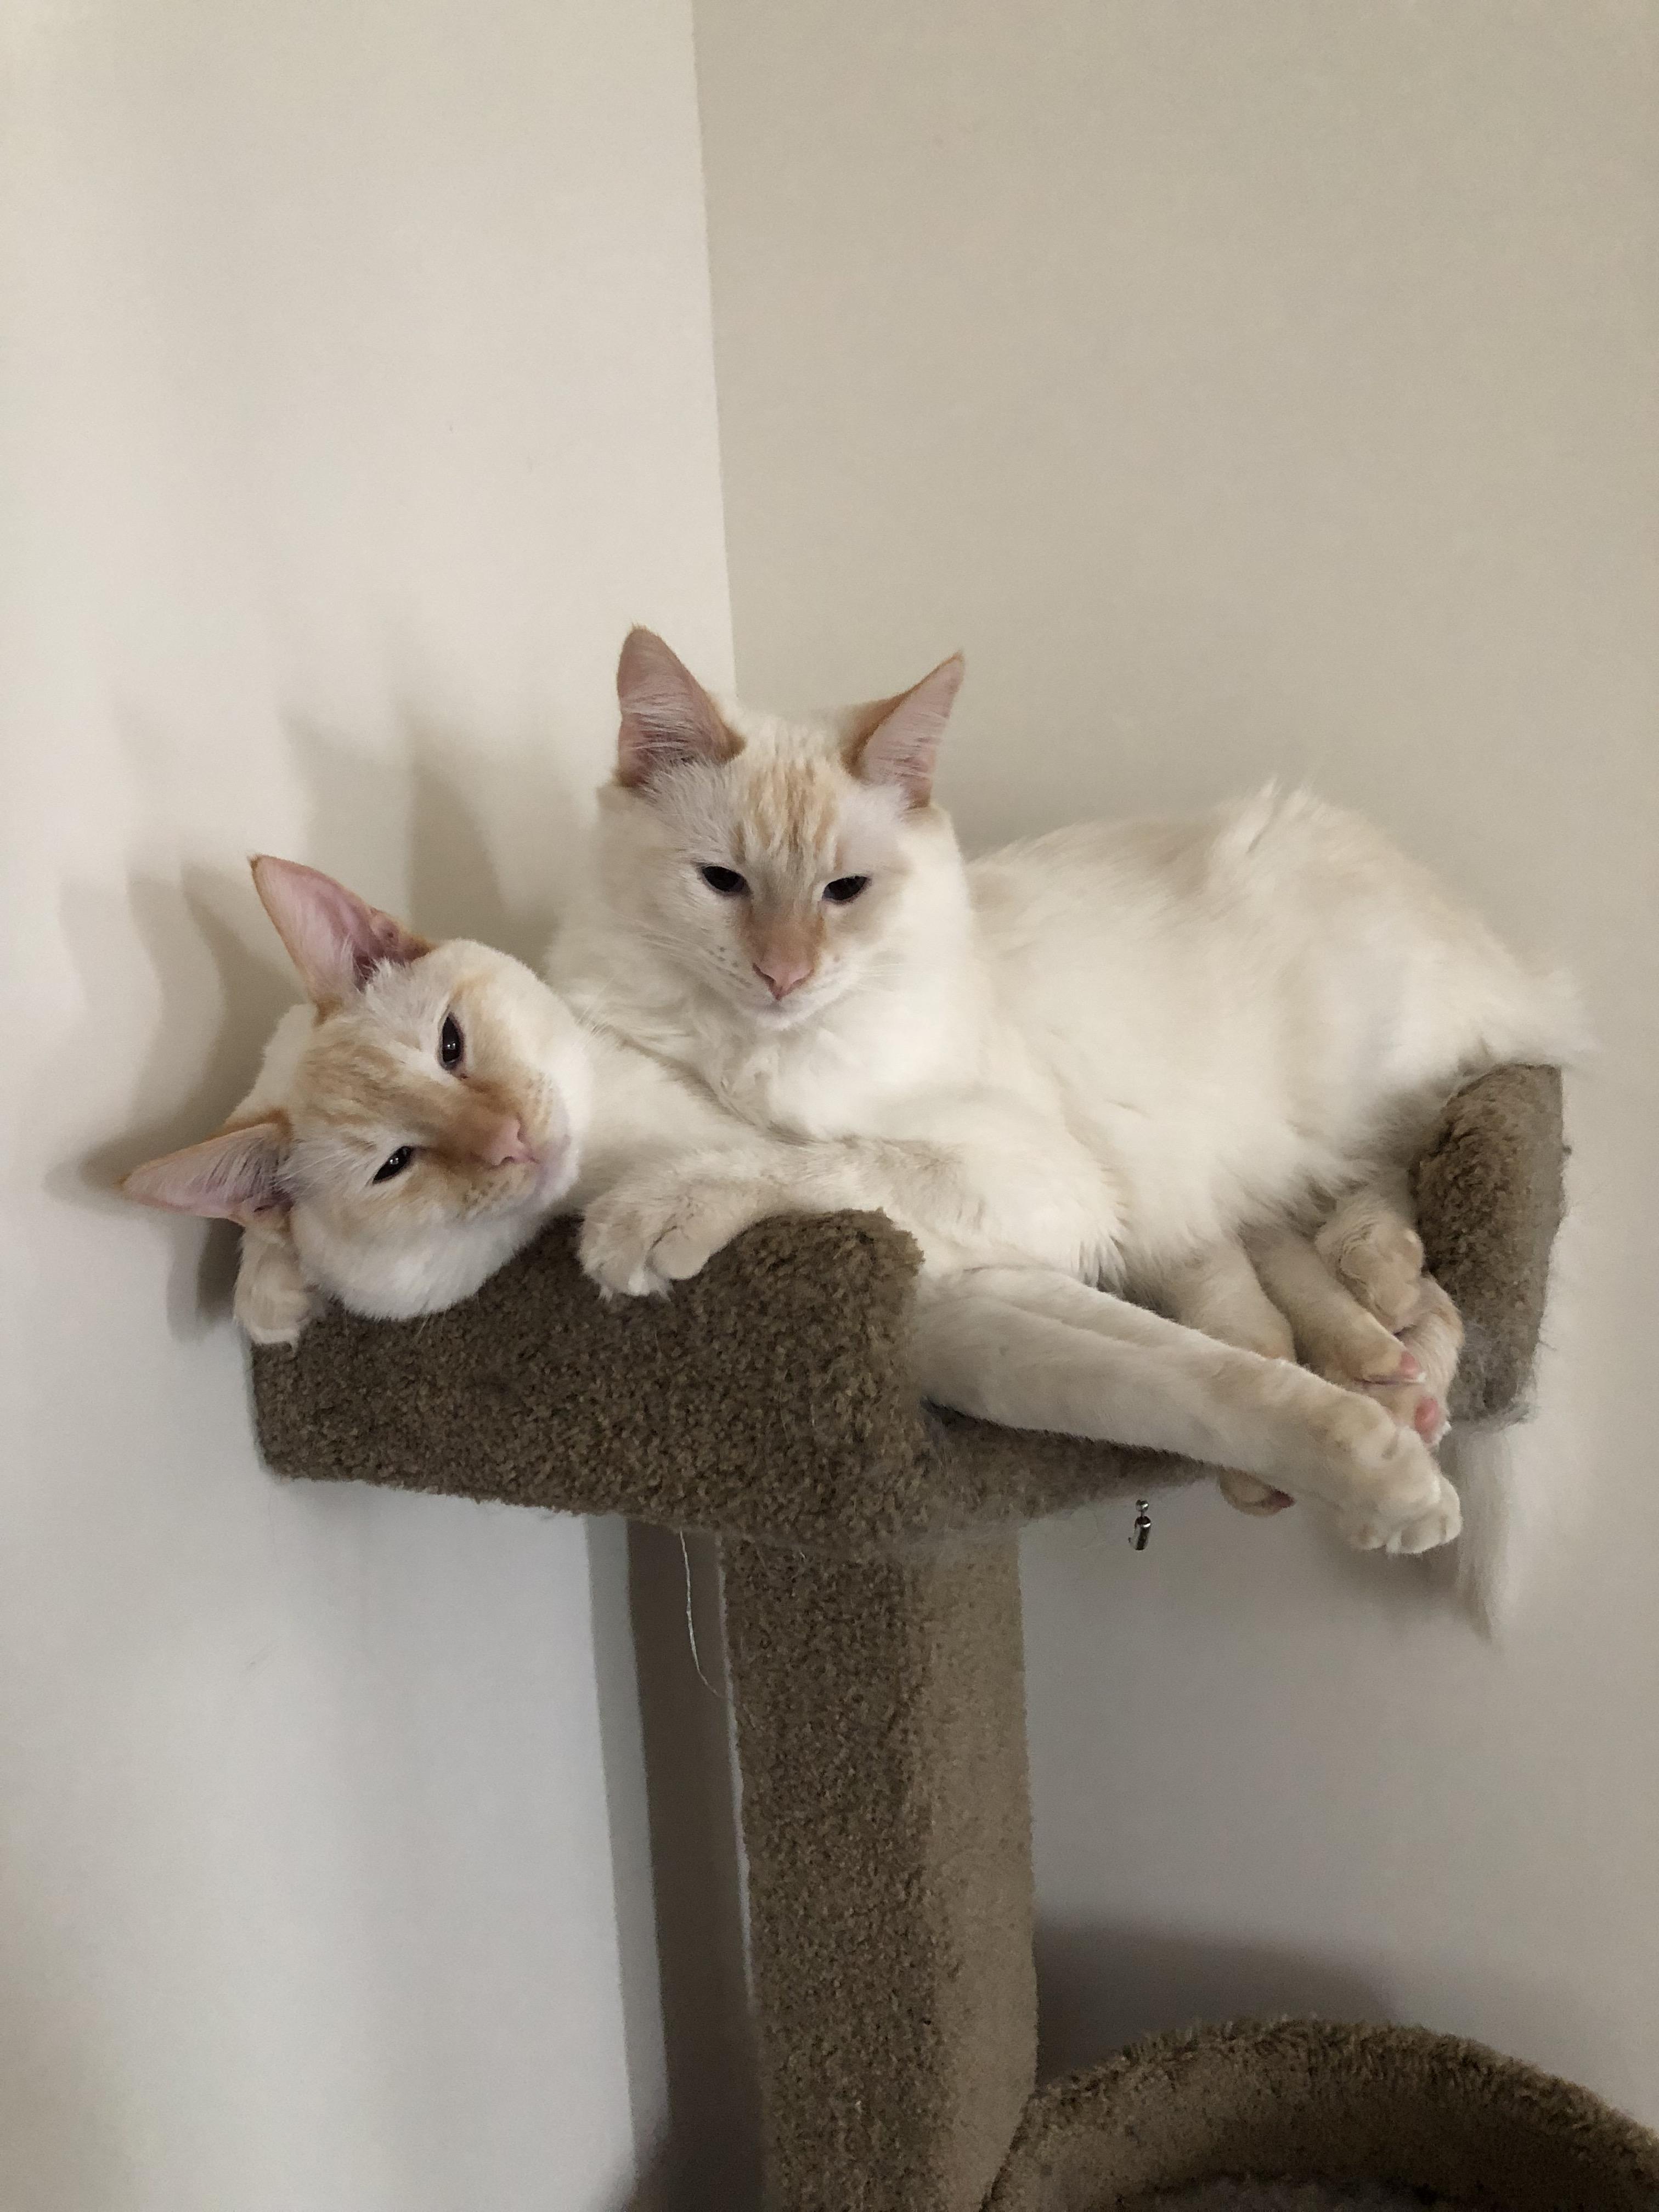 Brothershttps//i.redd.it/bqyufkgecp321.jpg Baby cats